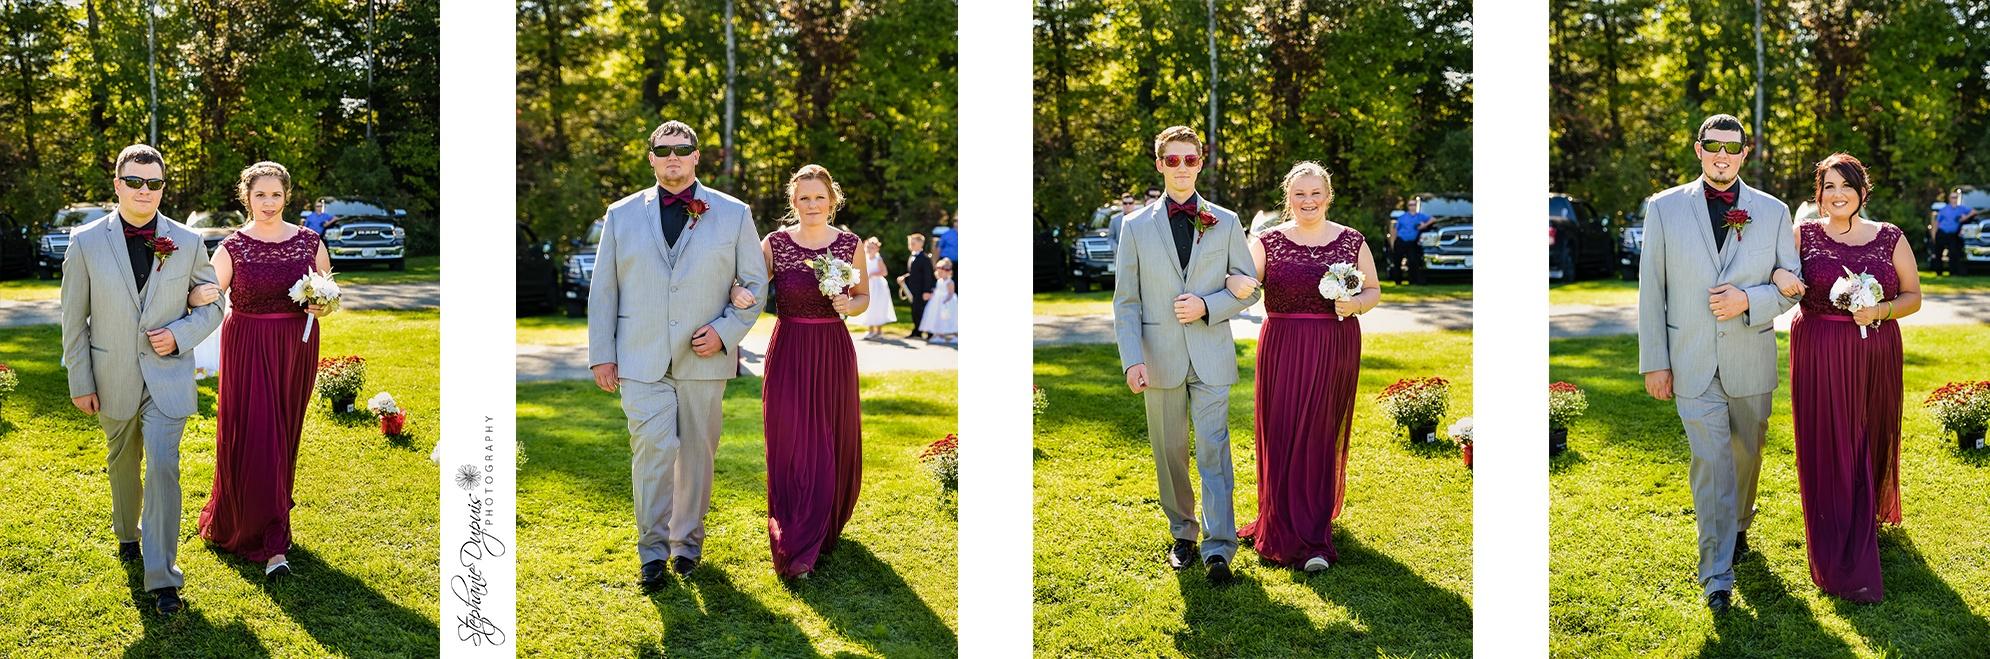 Lancaster Wedding Photographer 02 2 - Portfolio: Brown Wedding